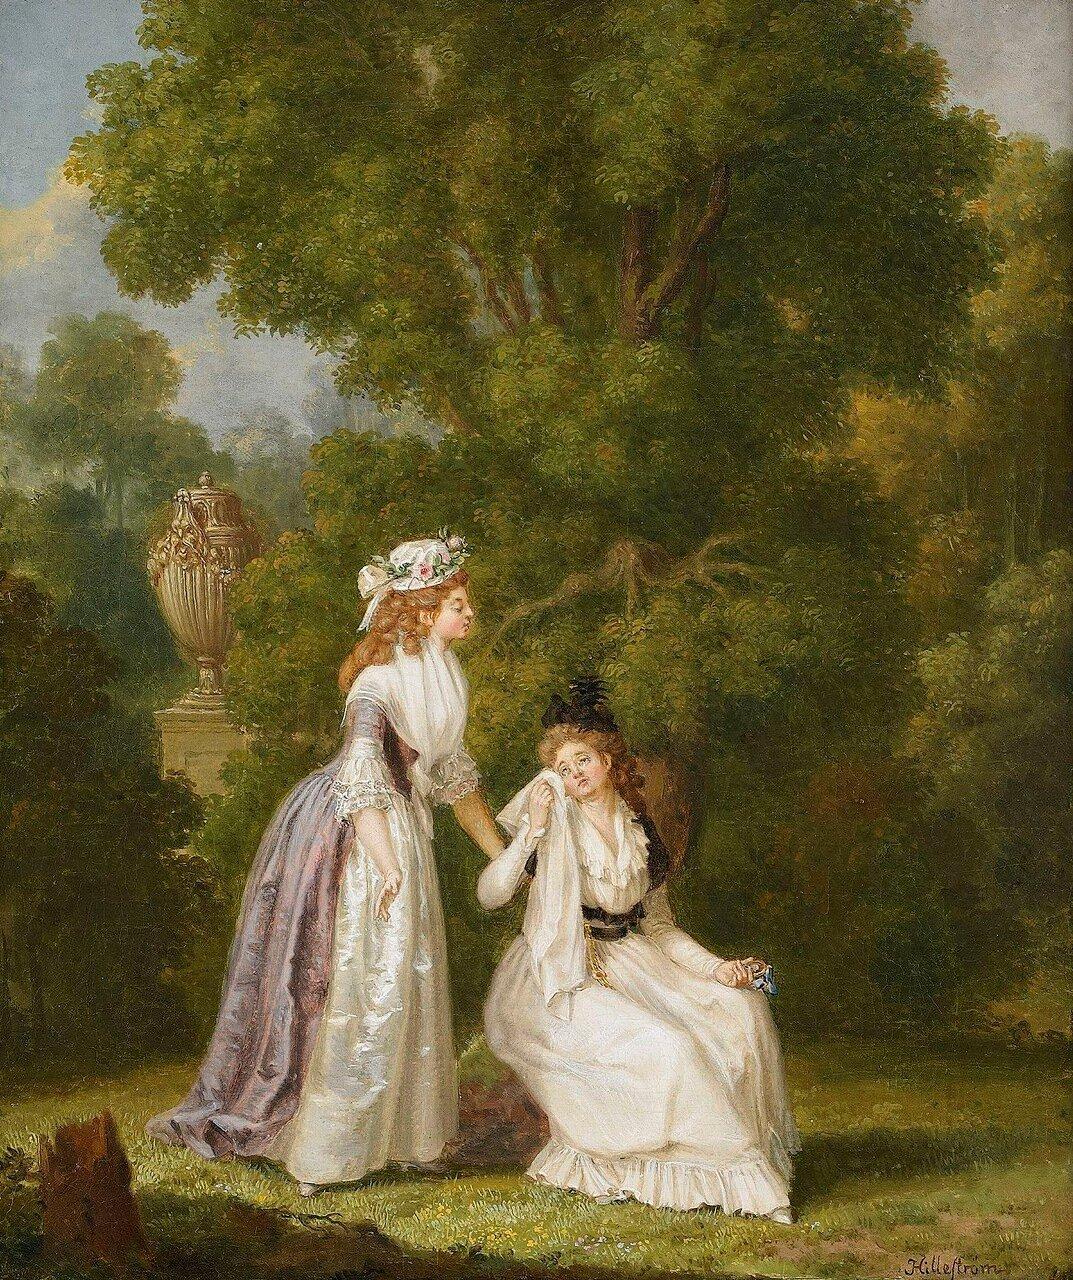 1733 in Sweden